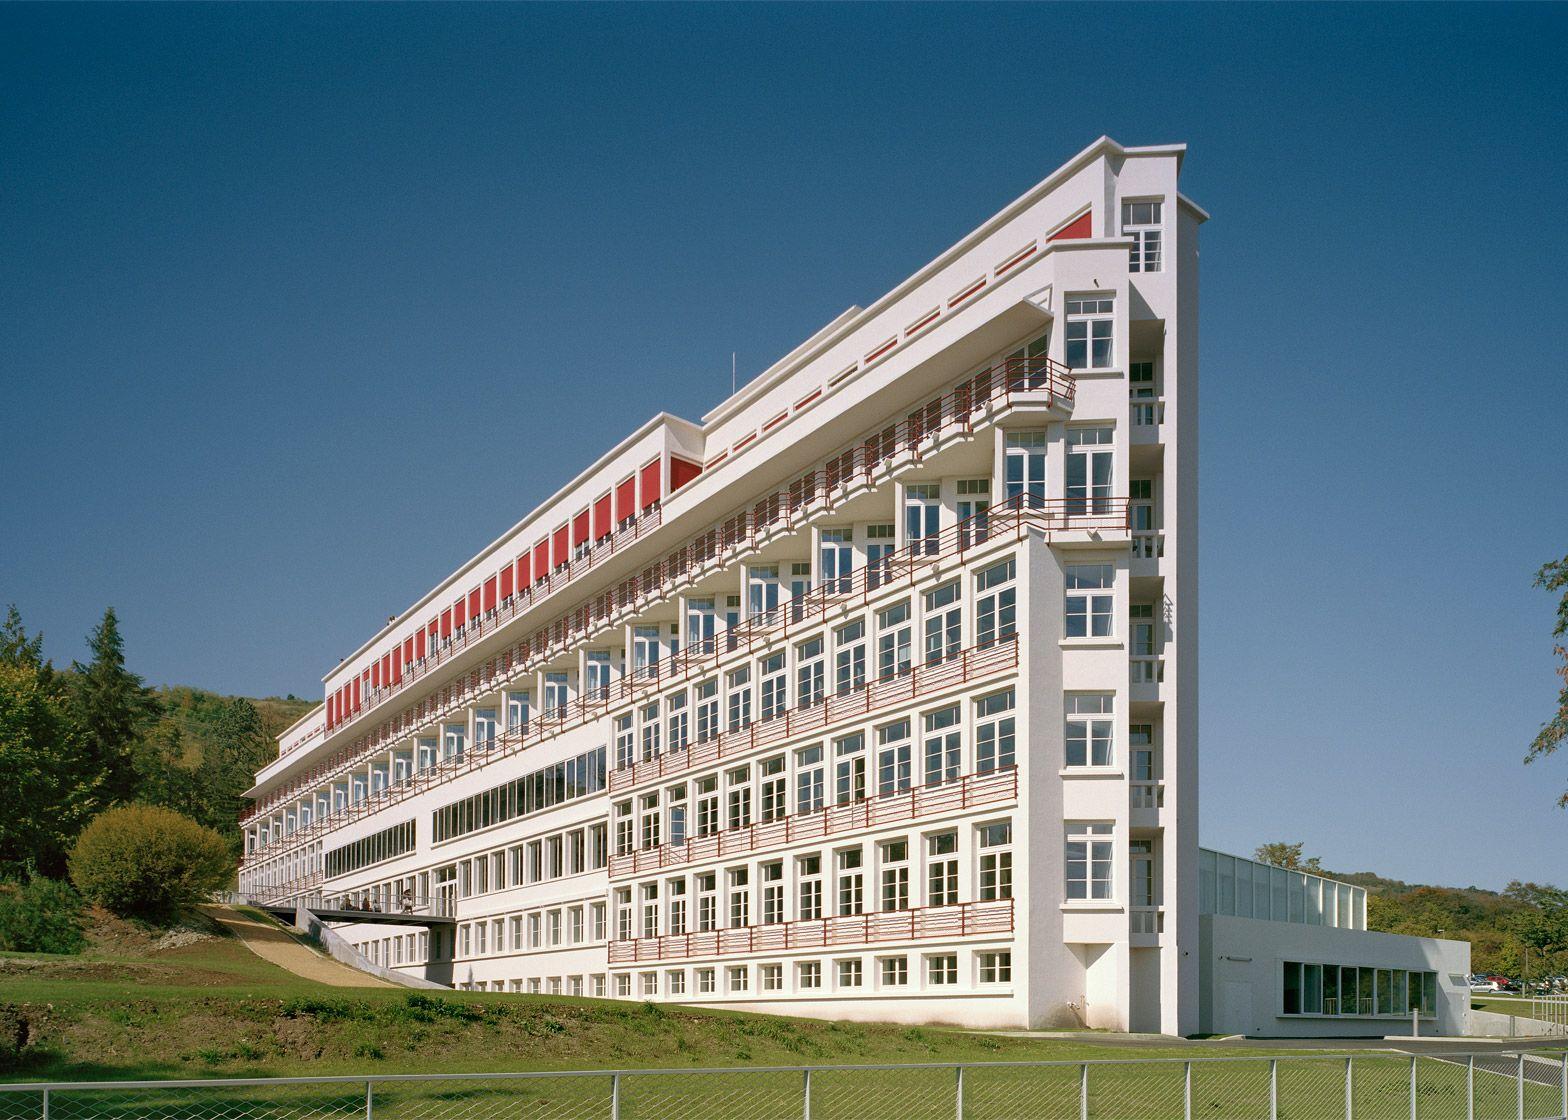 École D Architecture Clermont old sanatorium turned into clermont-ferrand school of